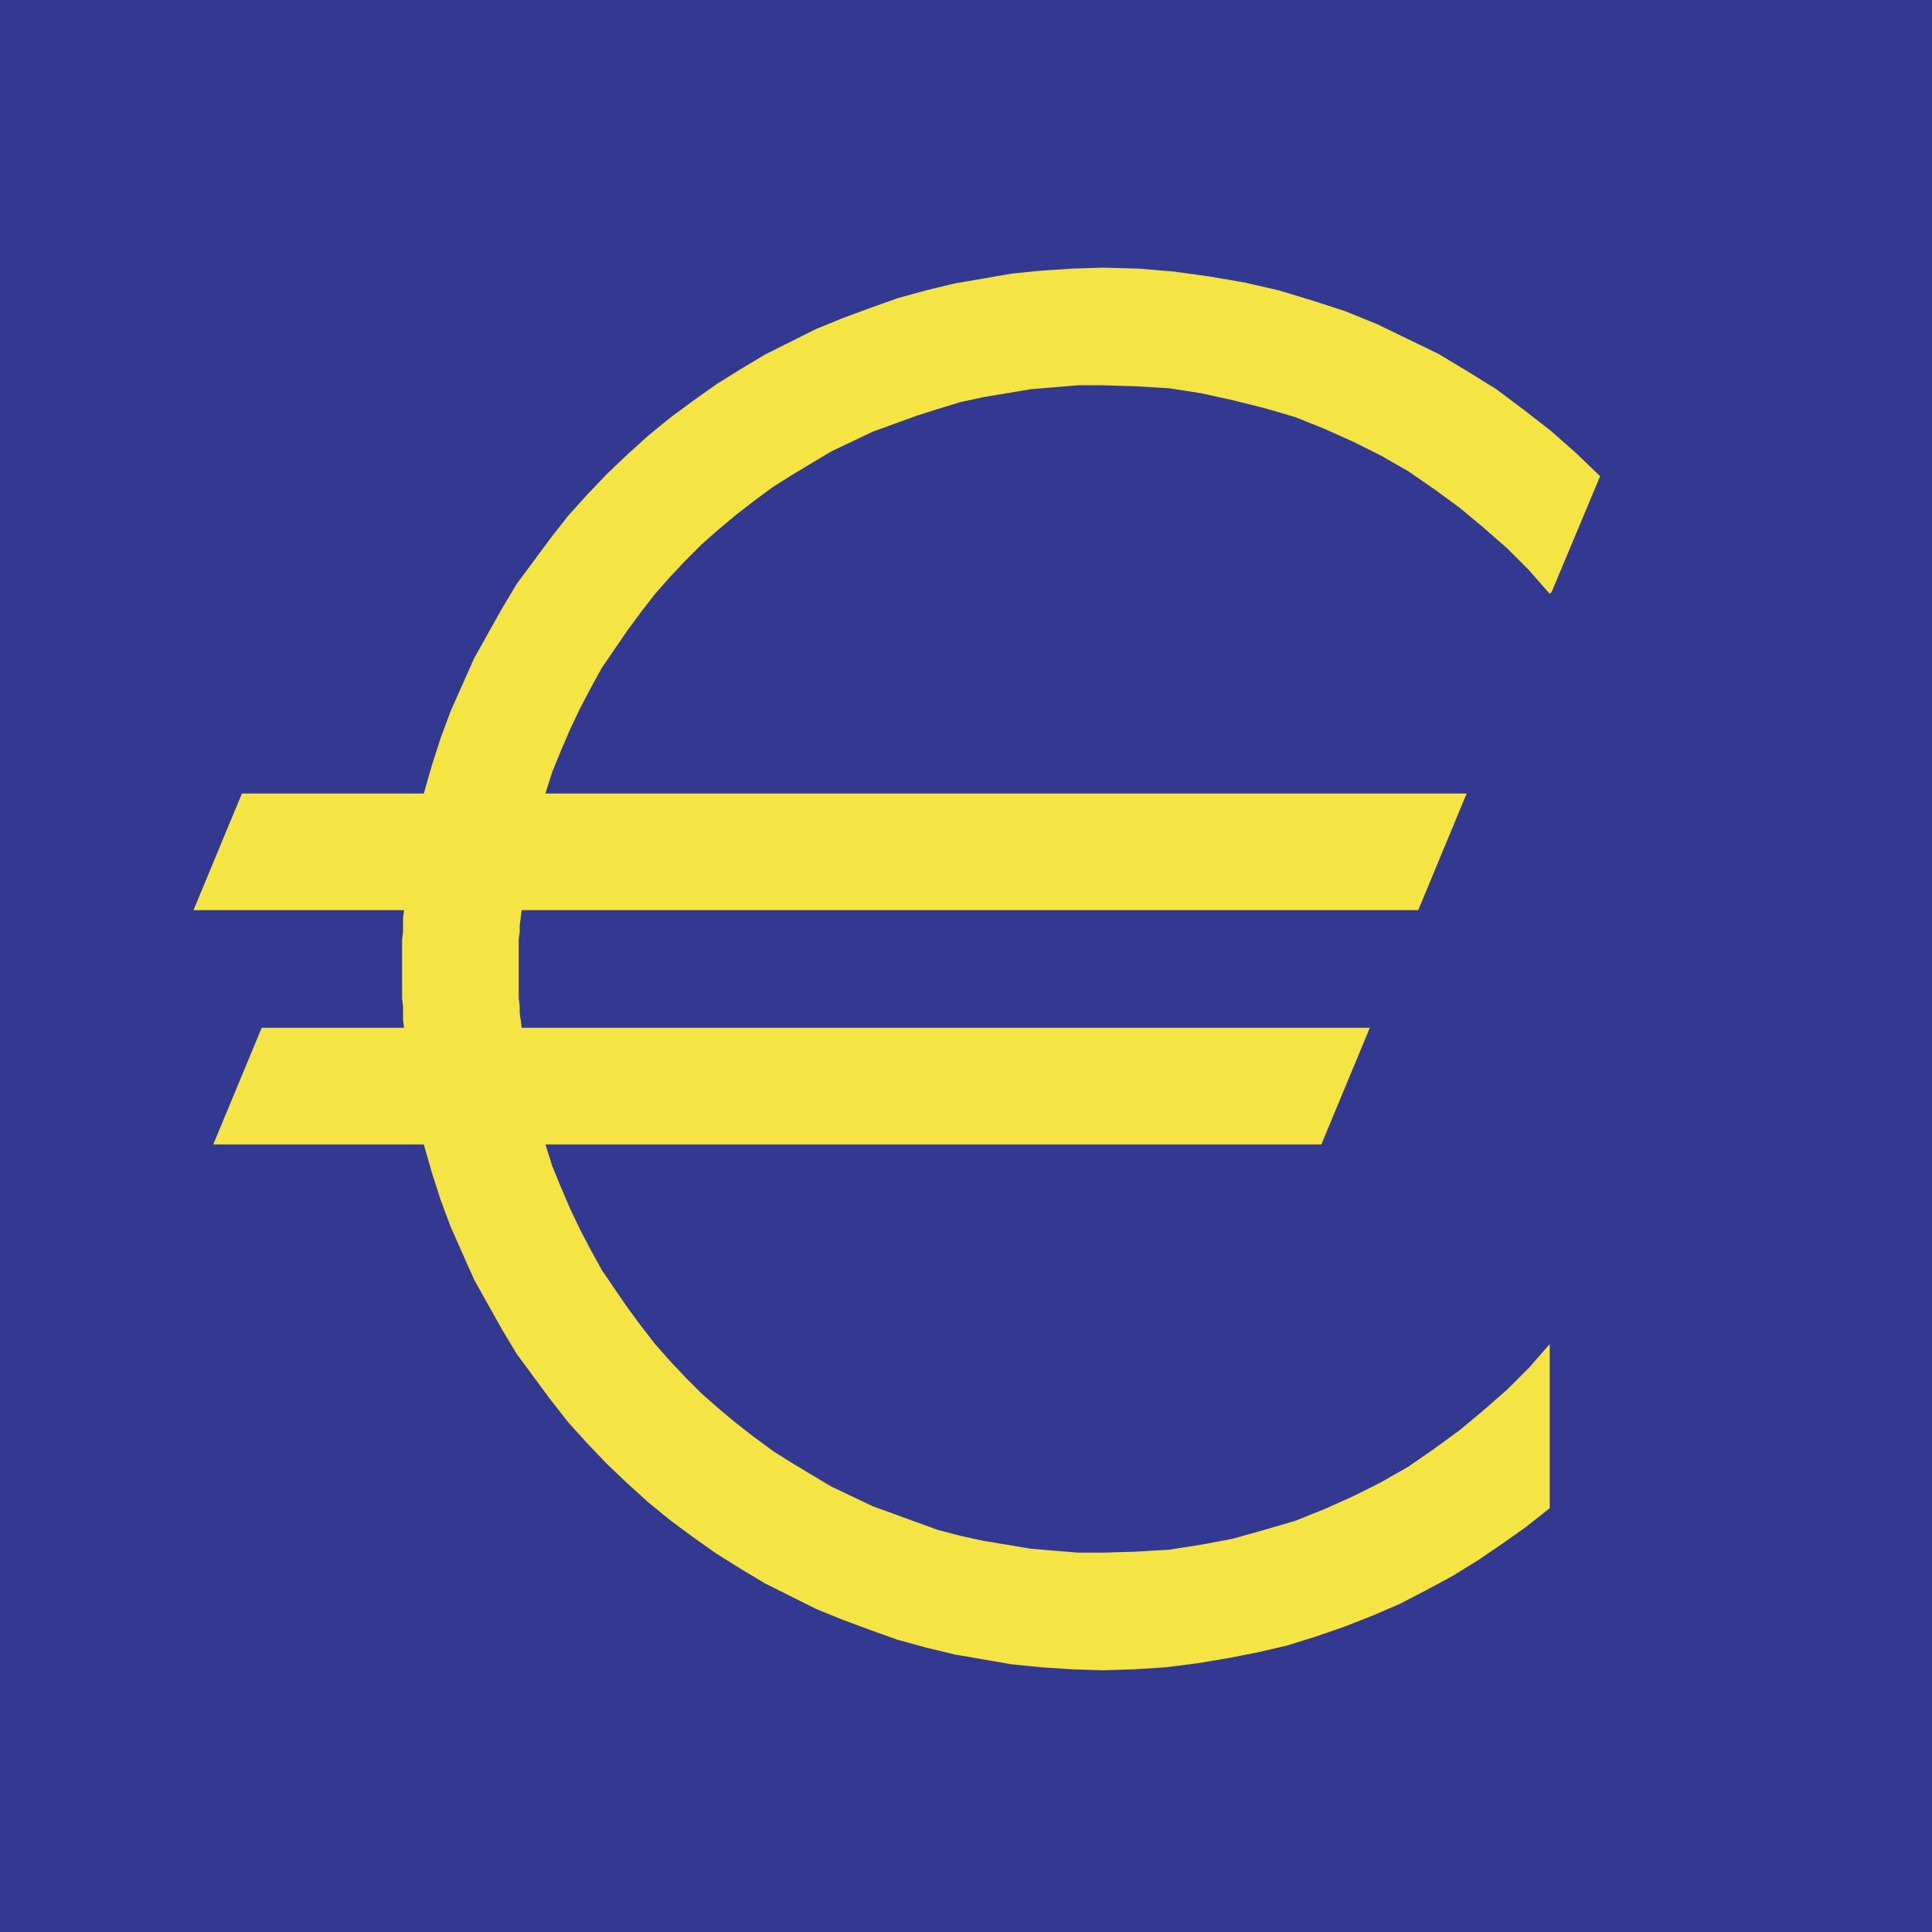 euro logo png transparent svg vector freebie supply euro logo png transparent svg vector